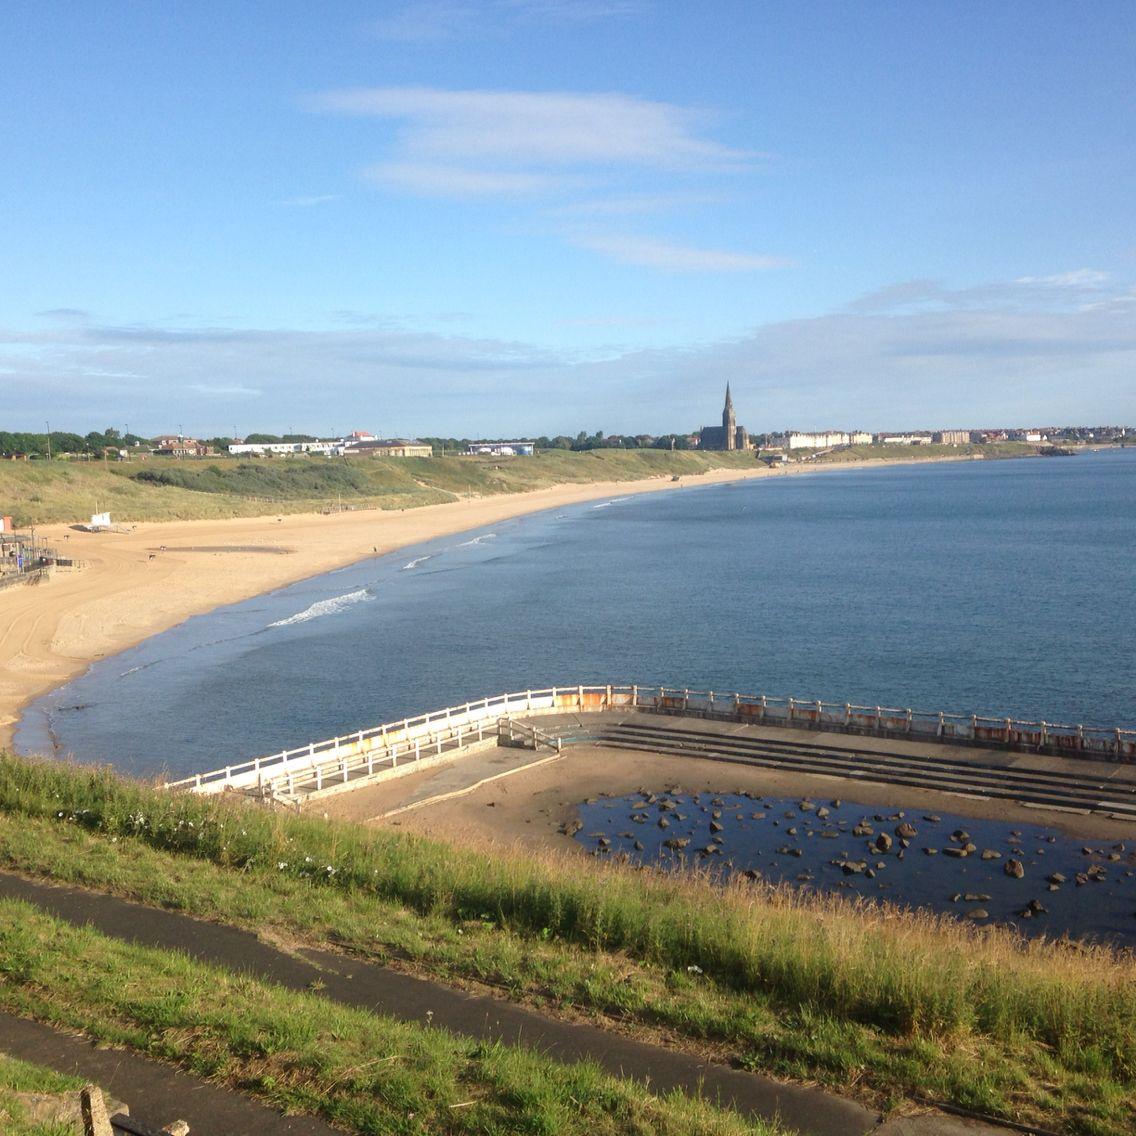 Tynemouth long sands beach bay beach 7am 22 St July 2015 www.tynemouthwebcam.com